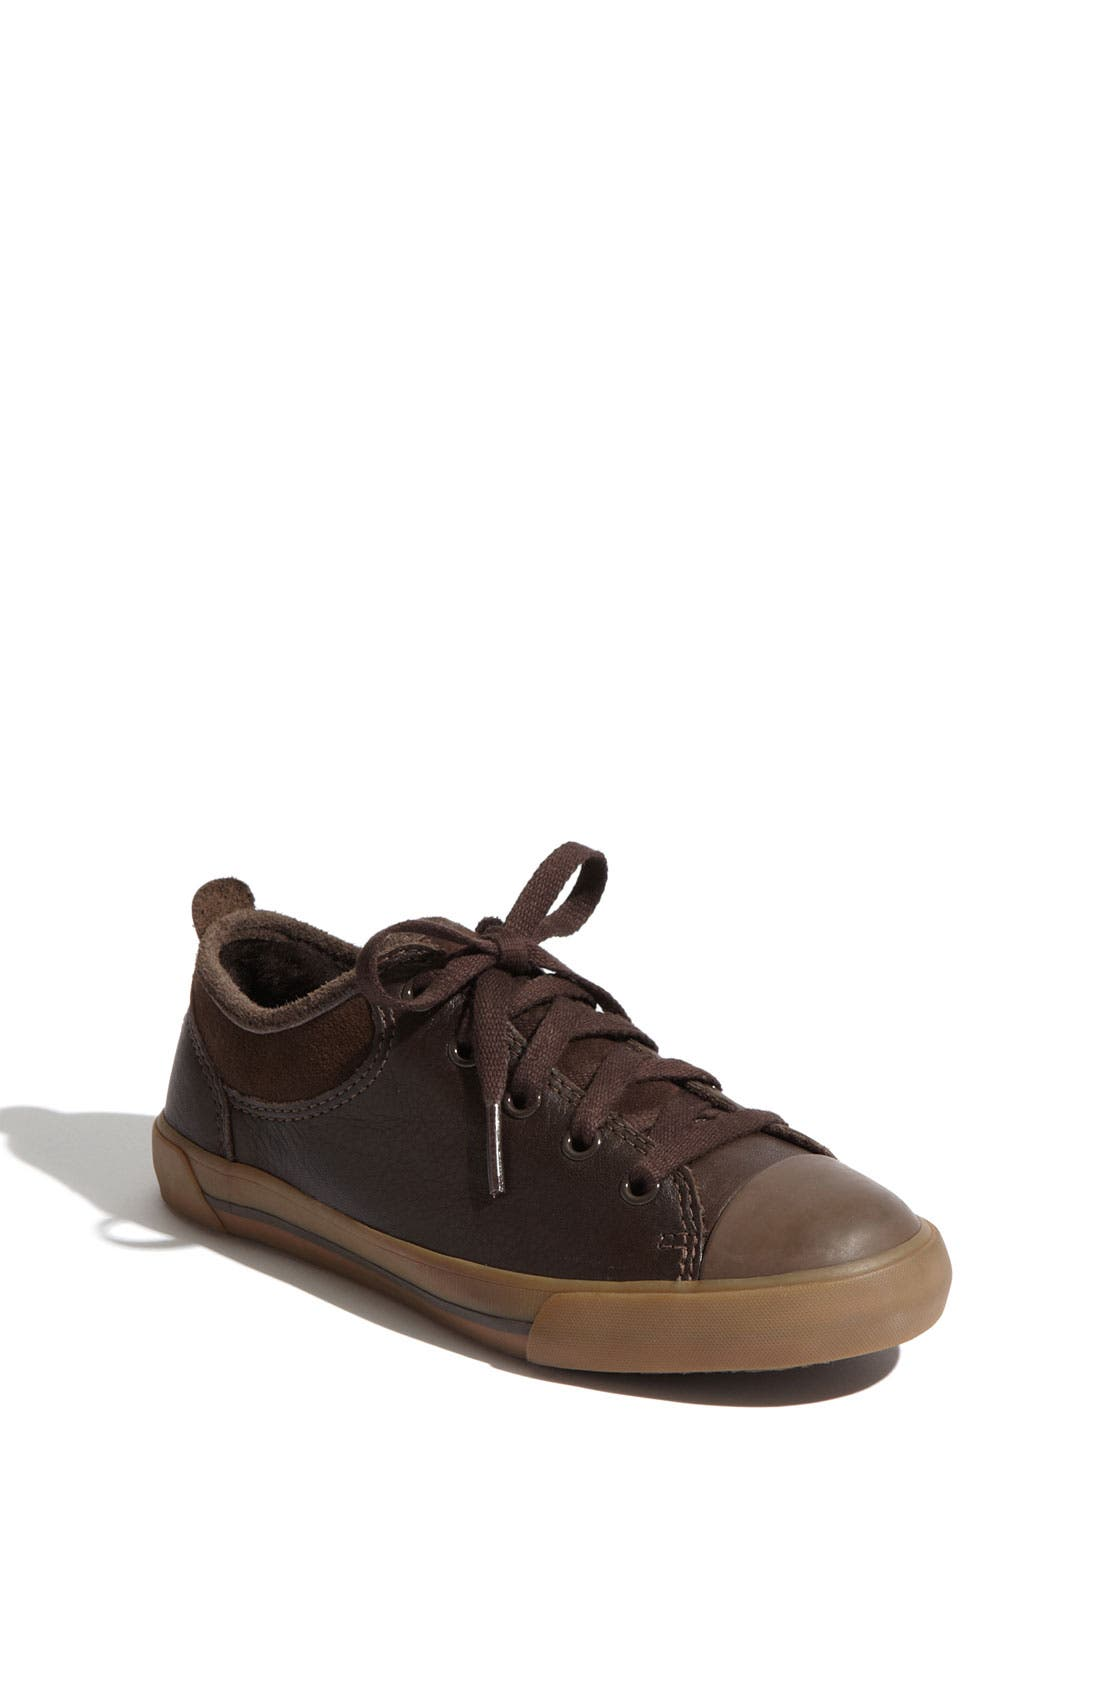 Alternate Image 1 Selected - UGG® Australia 'Kameron' Sneaker (Toddler, Little Kid & Big Kid)